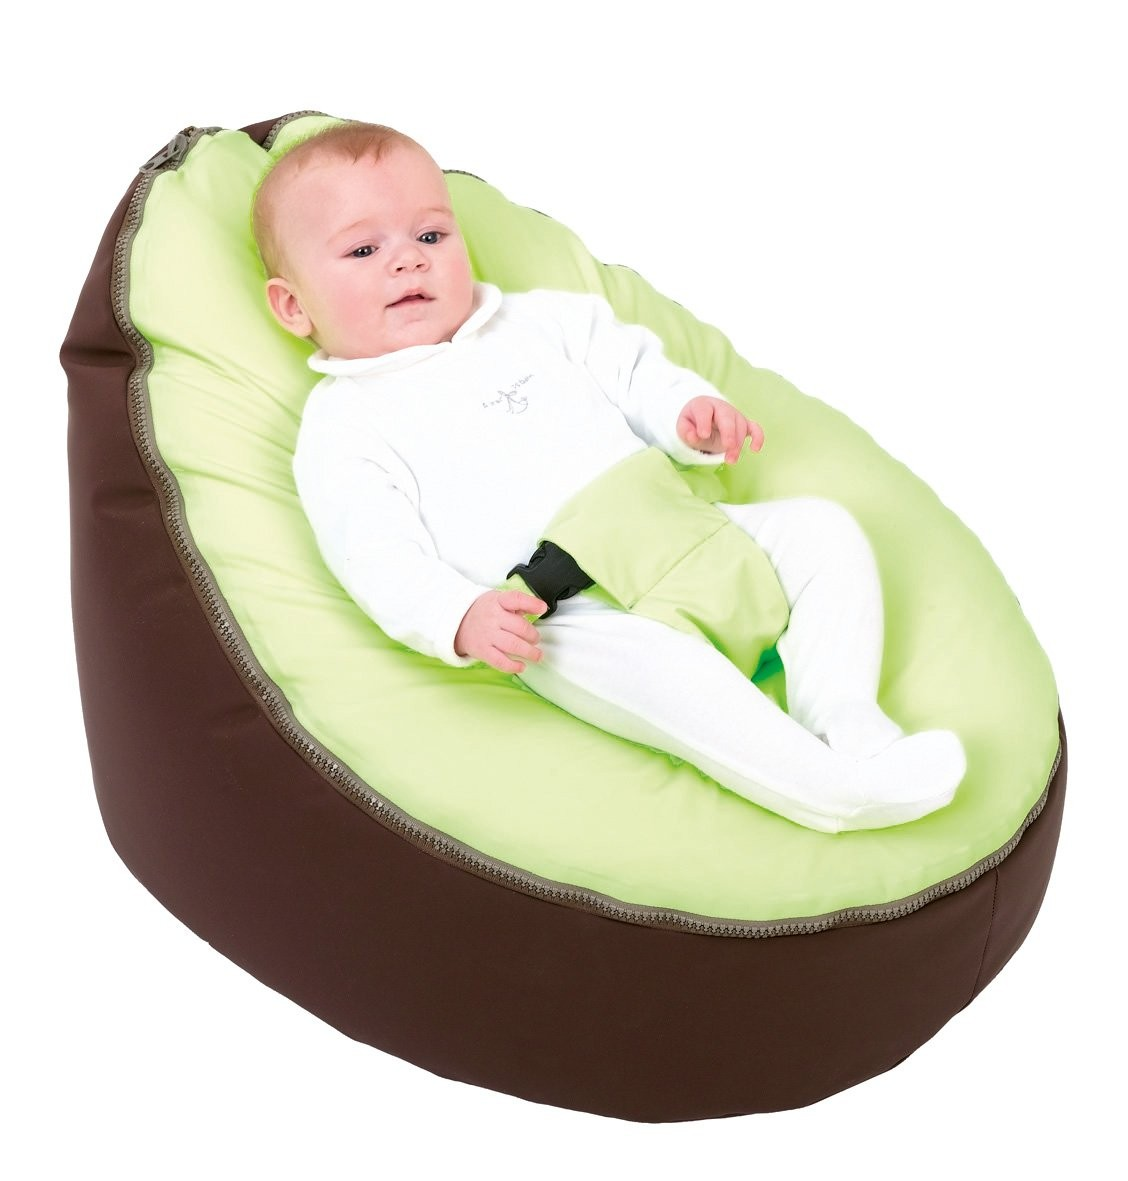 Doomoo Zitzak Lime.Doomoo Seat Poltrona Super Comfort Chocolat Lime La Culla Dei